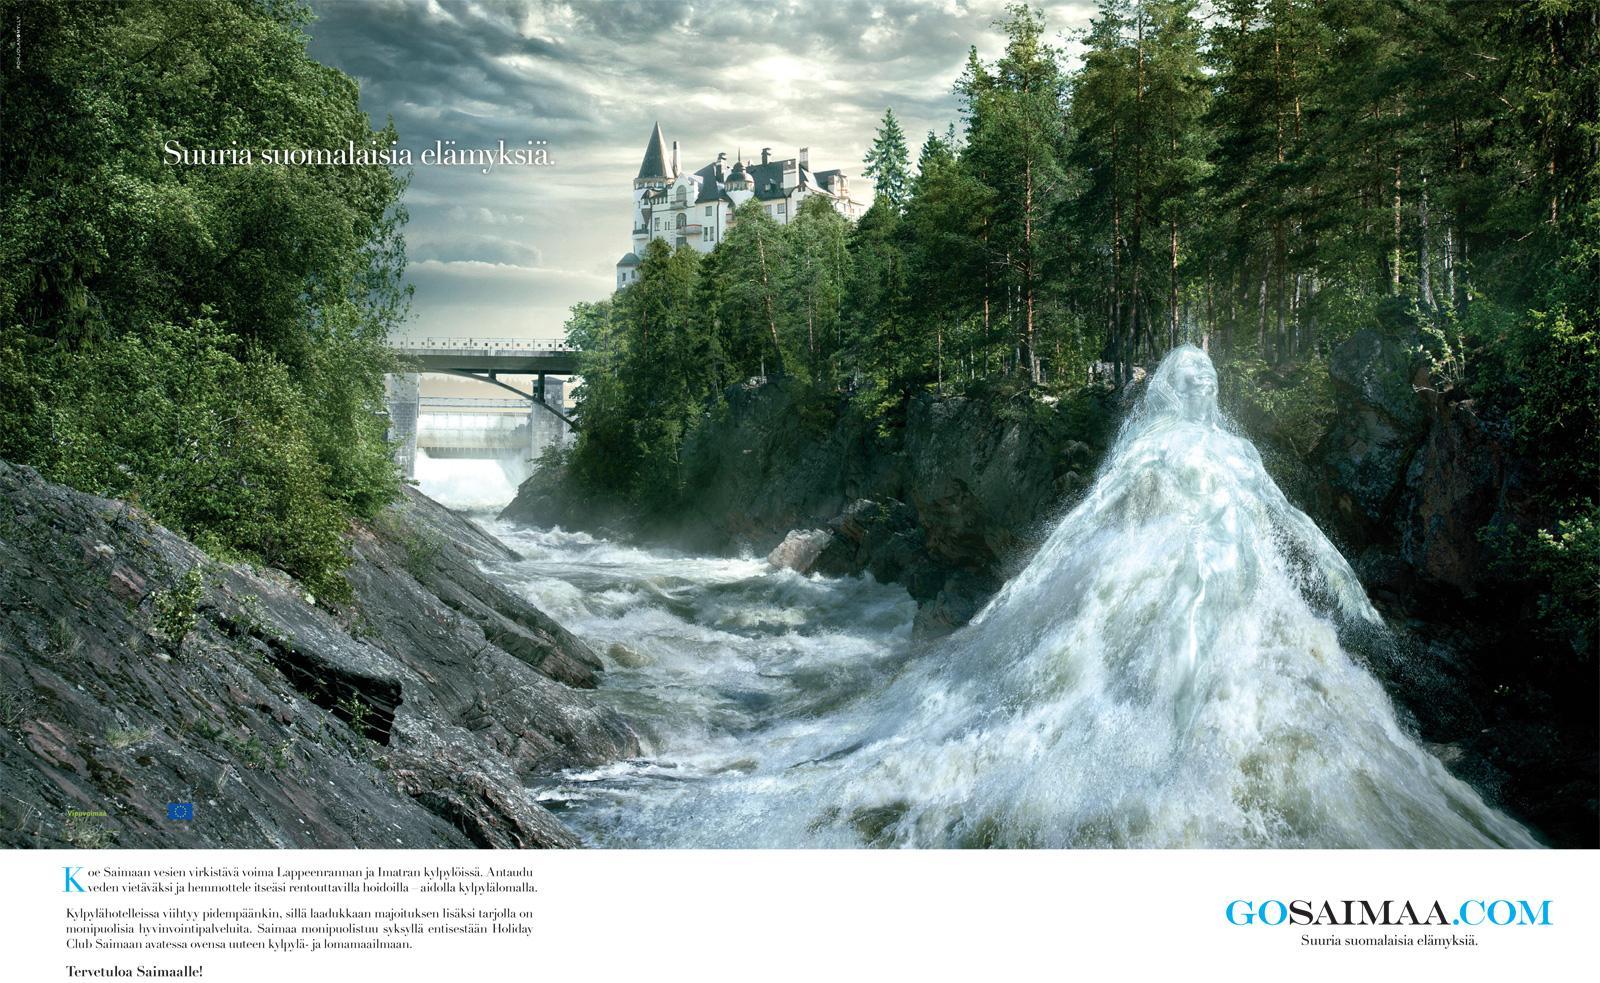 GoSaimaa.com Print Ad -  Great Finnish Experiences, 2